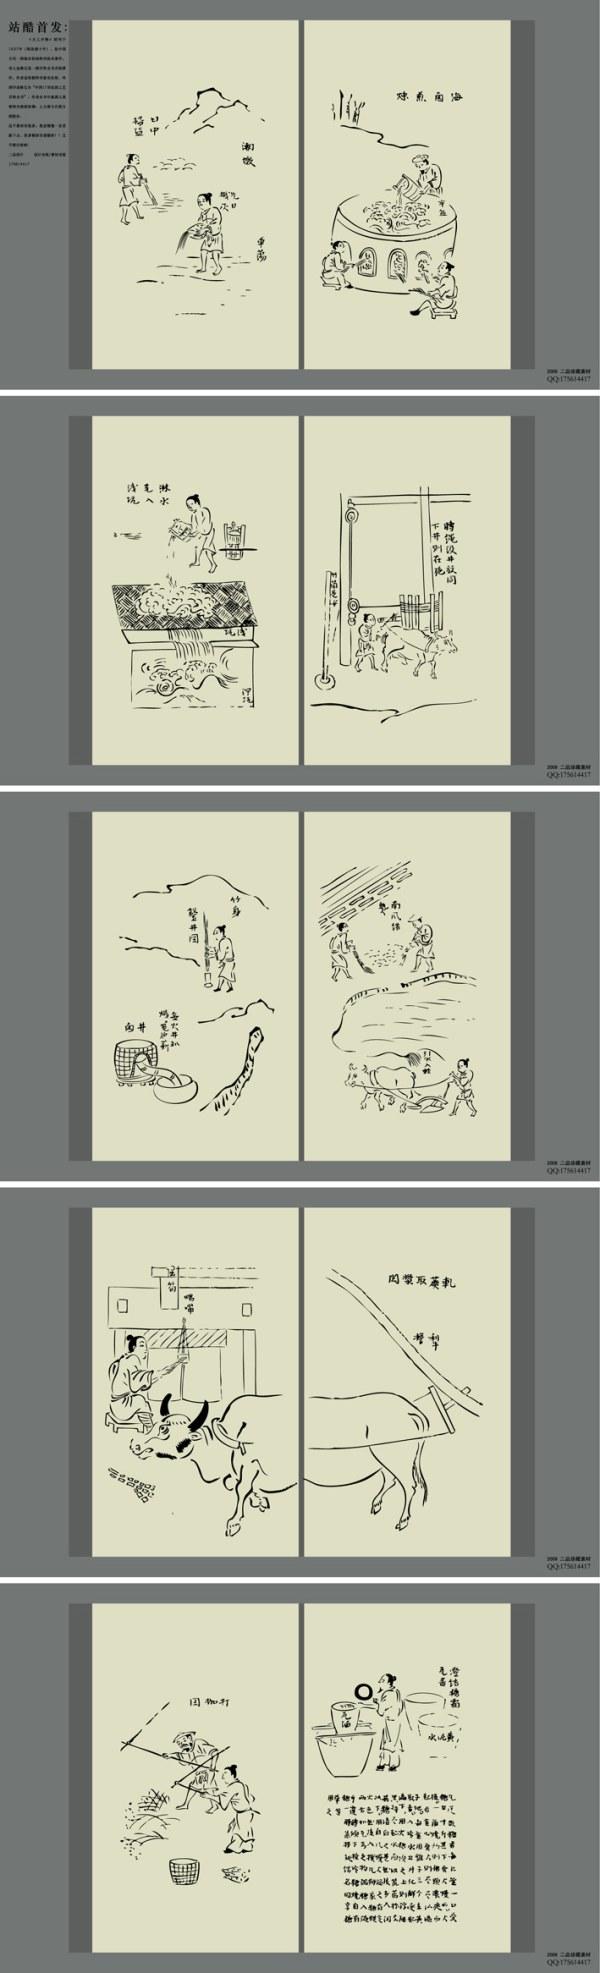 Himmlische Kreationen Sammlung Vektor-Material (6)